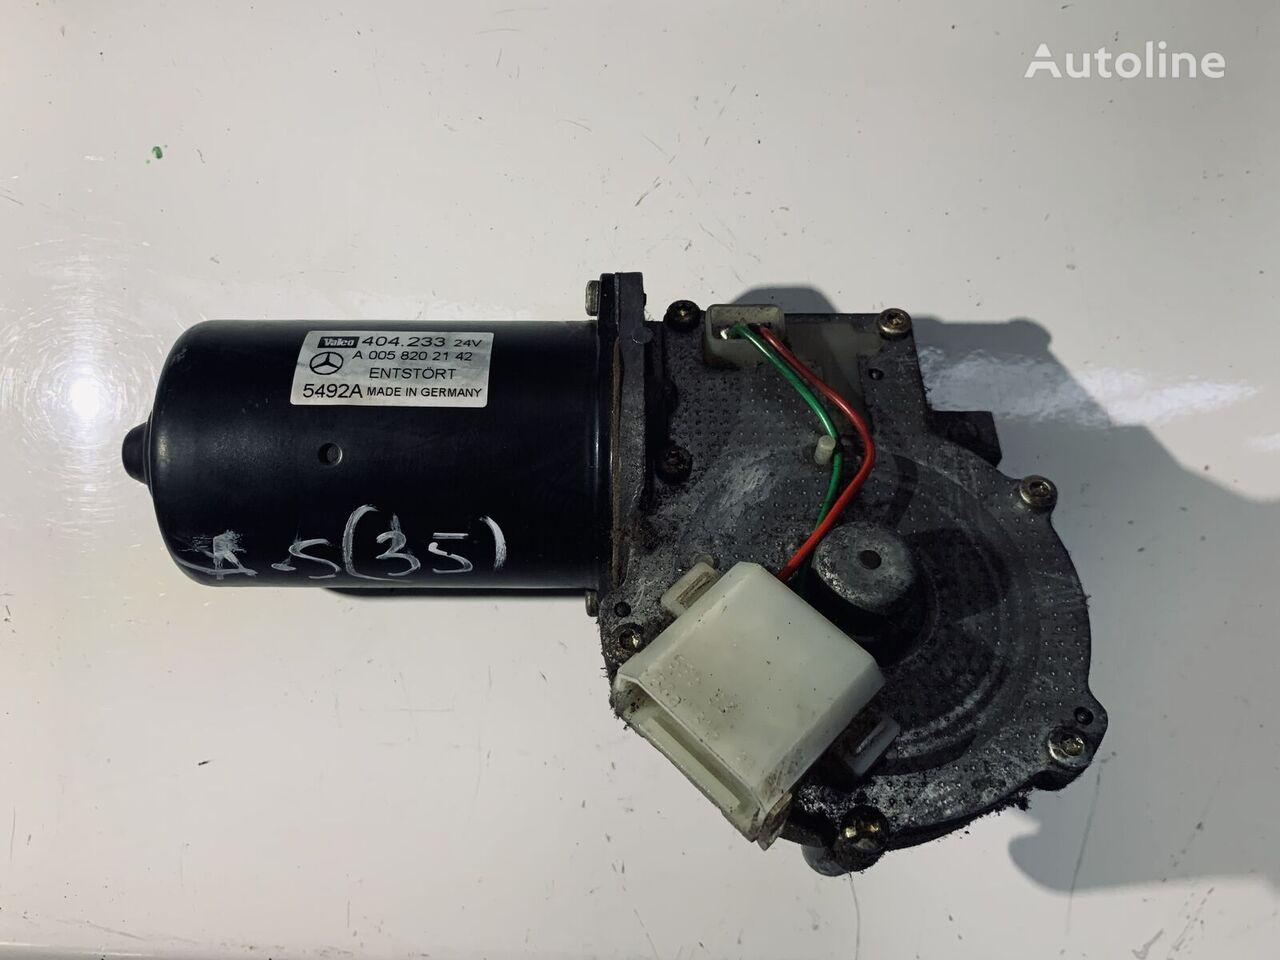 MERCEDES-BENZ (5492A) wiper motor for MERCEDES-BENZ ACTROS tractor unit